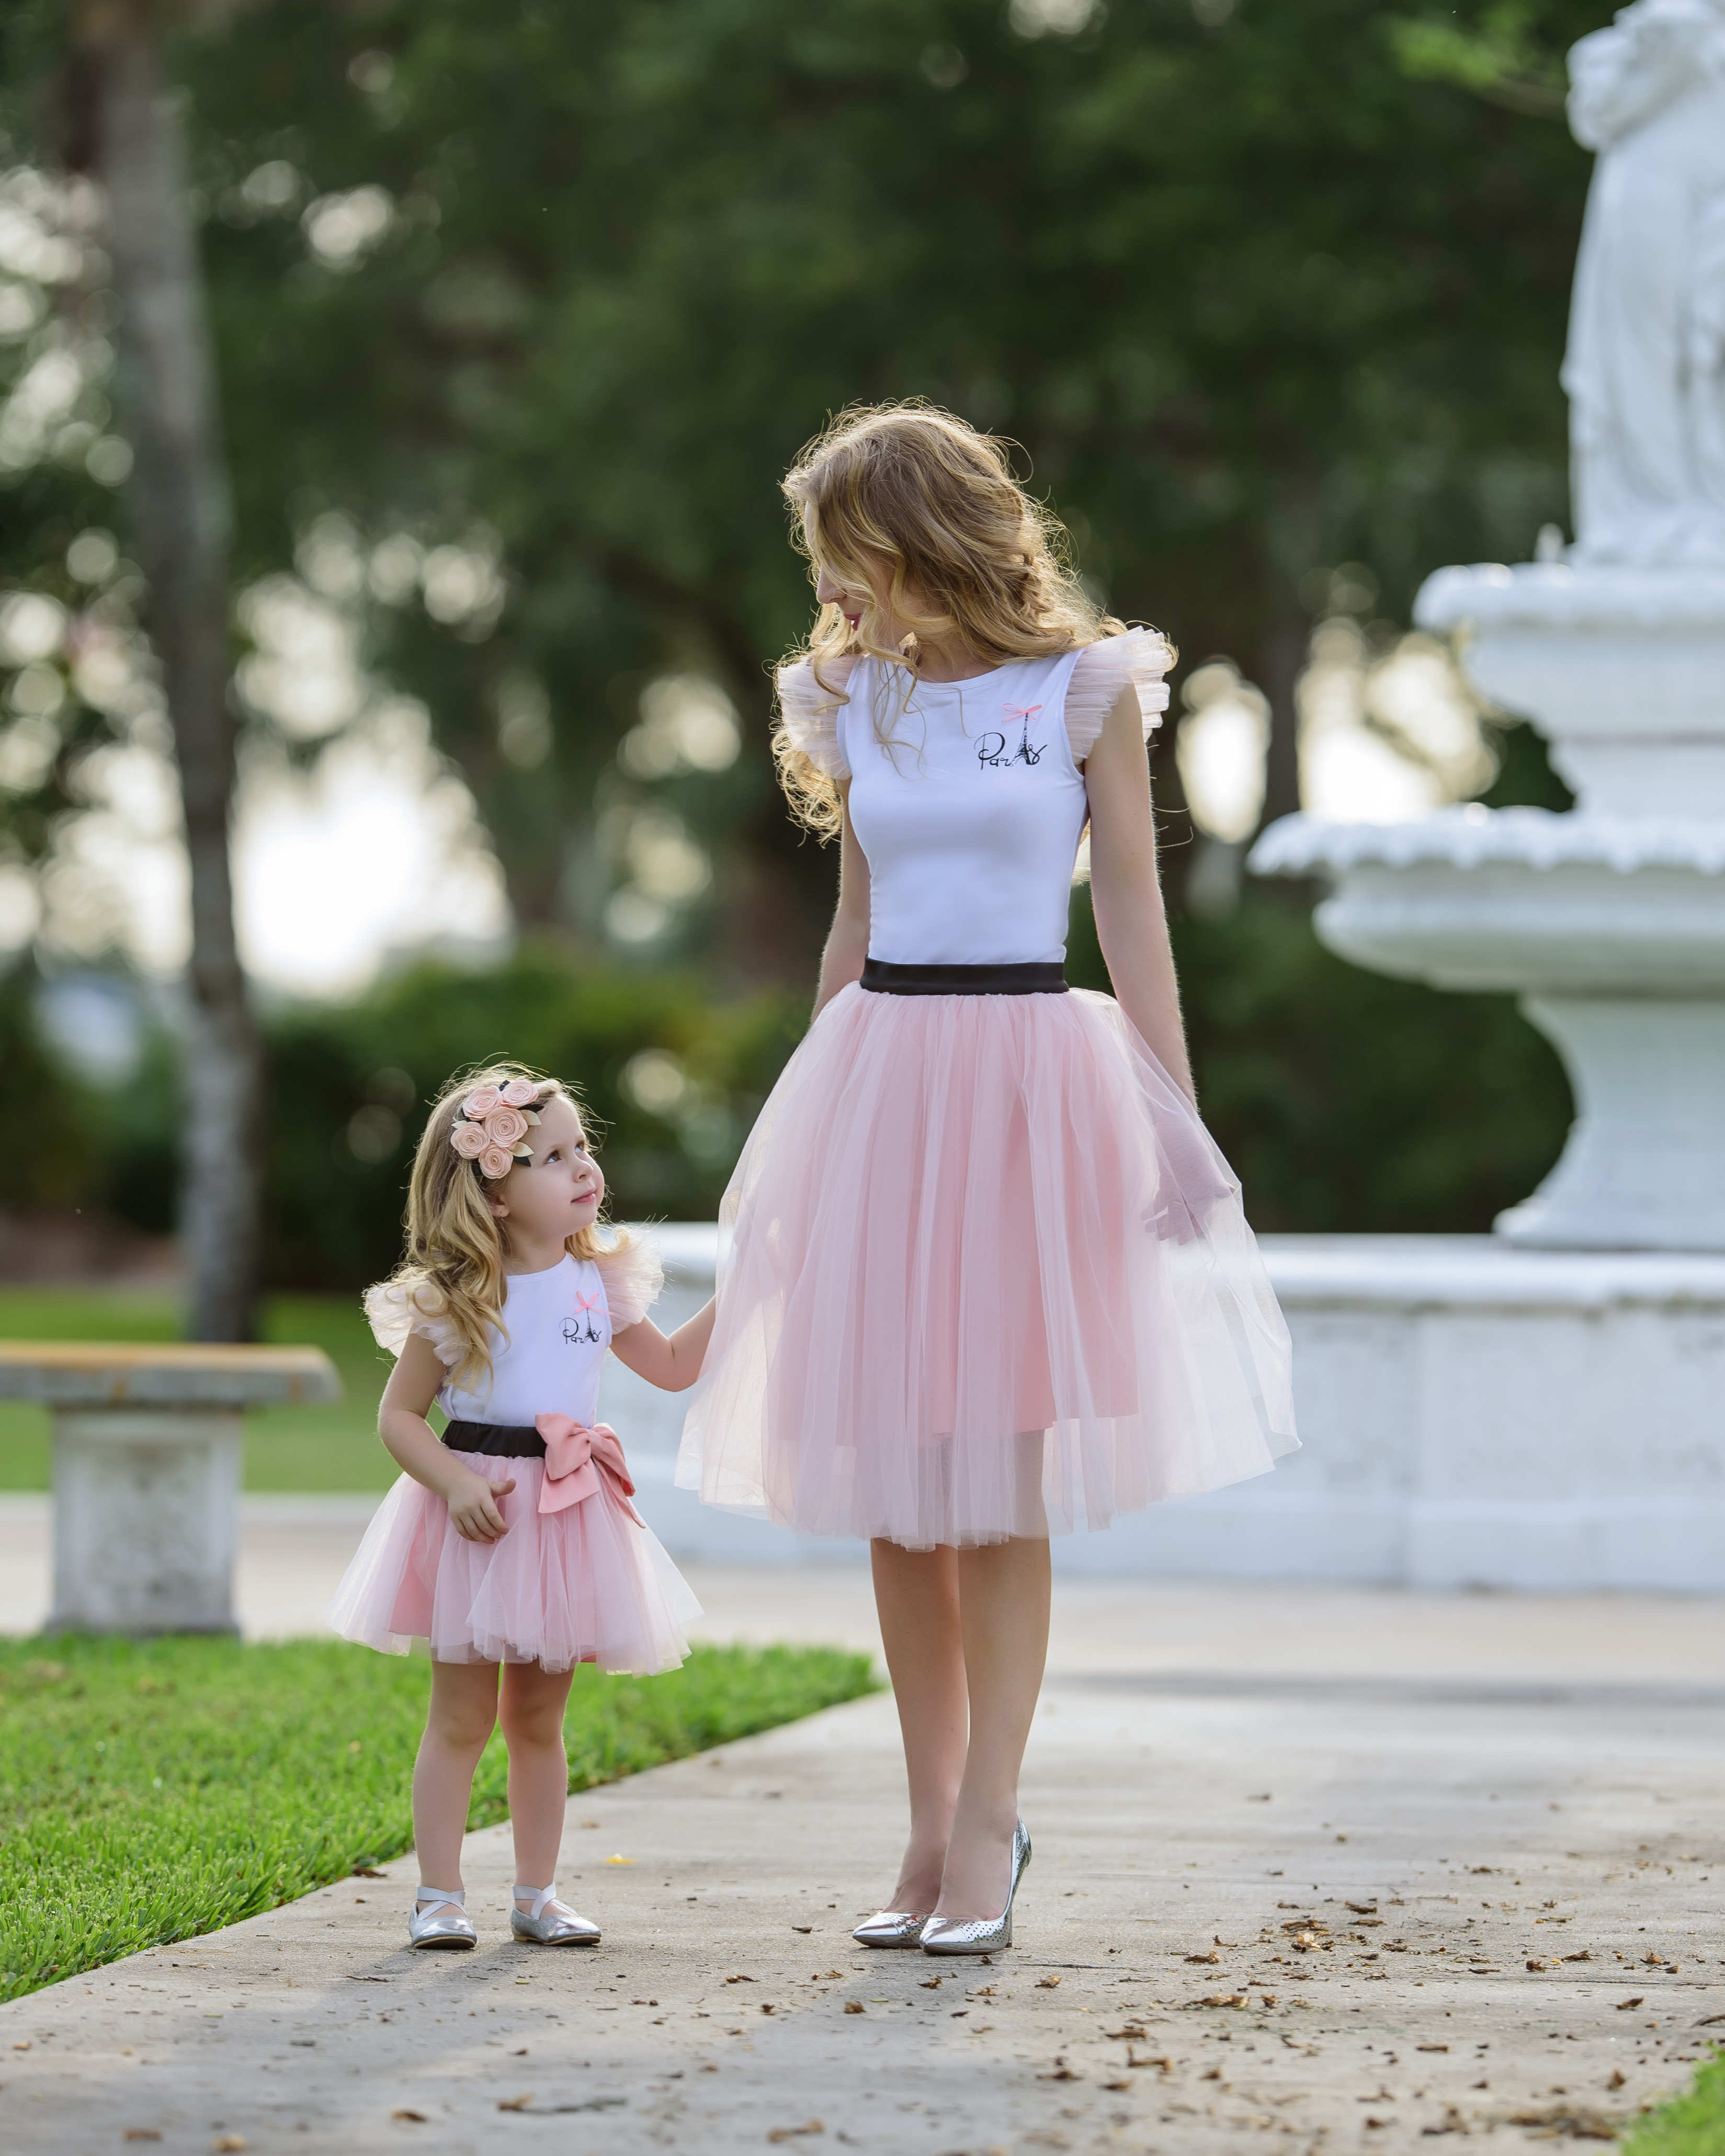 Rendezvous Tulle Skirt In Pretty Ballerina Women Elzoria